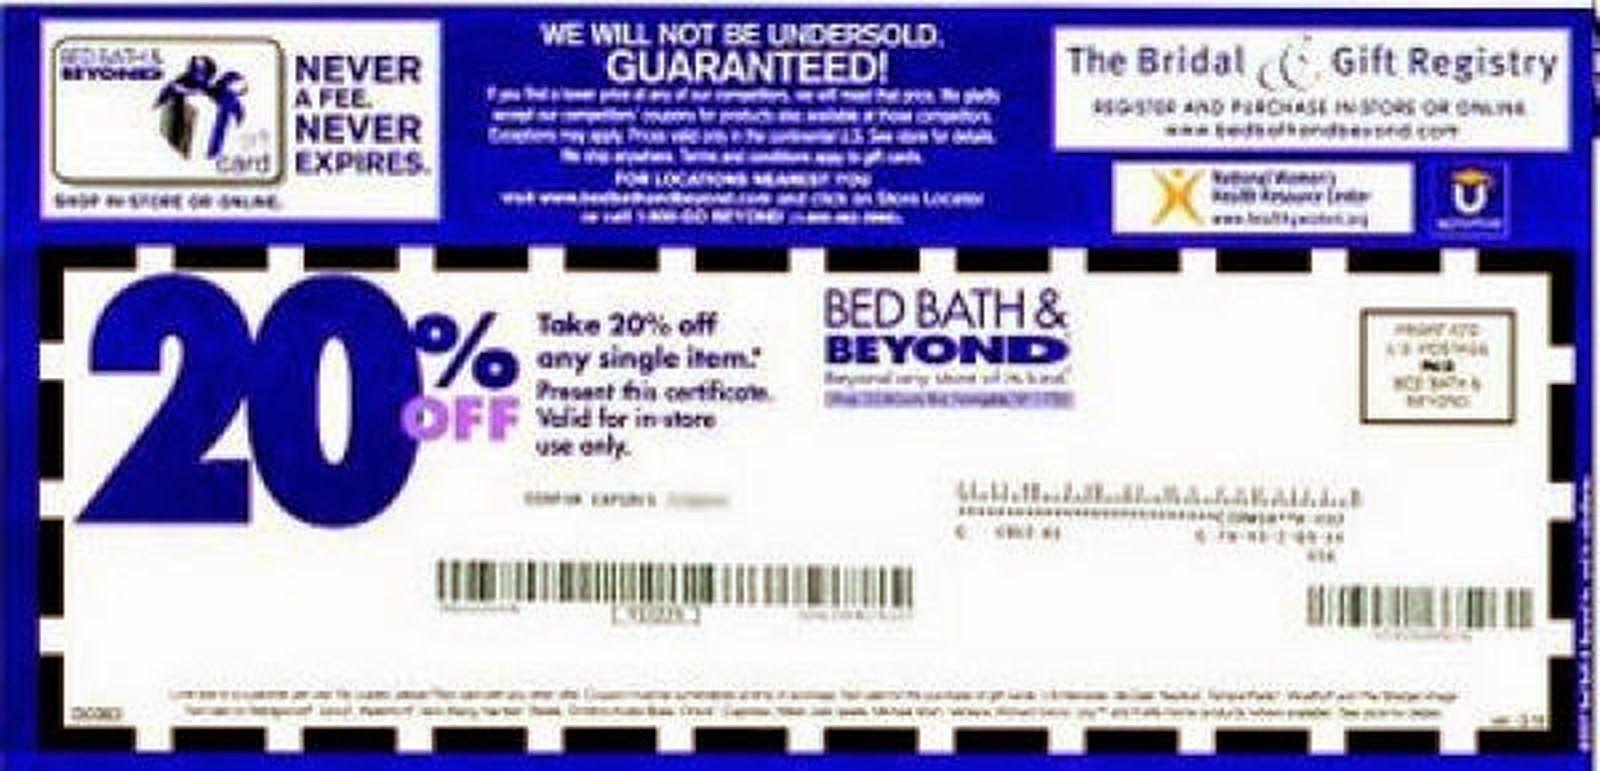 Free Printable Coupons Bed Bath And Beyond Coupons Printable Coupons Free Printable Coupons Online Coupons